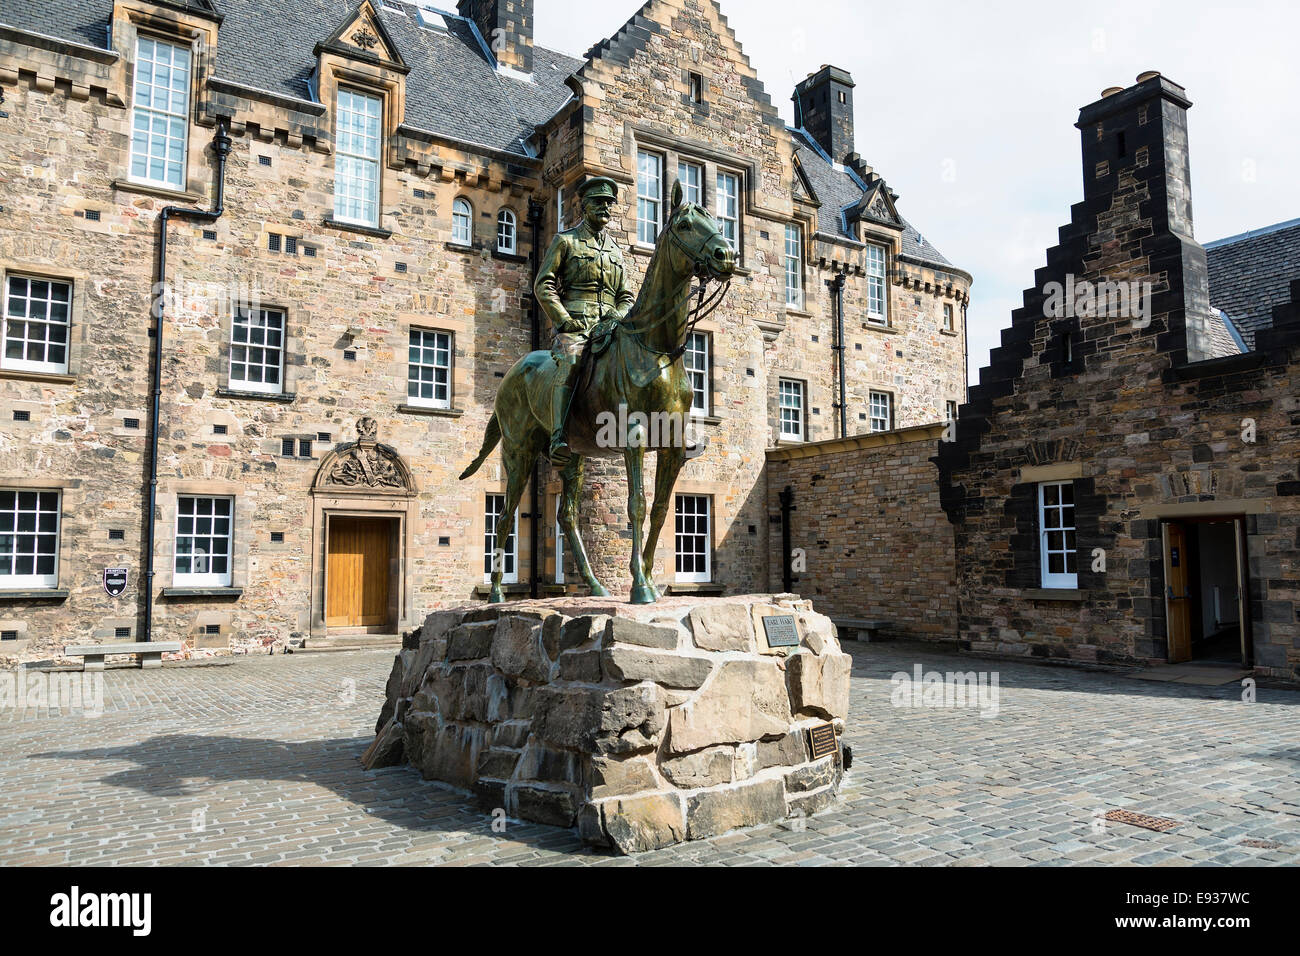 Statue of Earl Haig in front of hospital building, Historic Edinburgh Castle, Edinburgh, Scotland Stock Photo